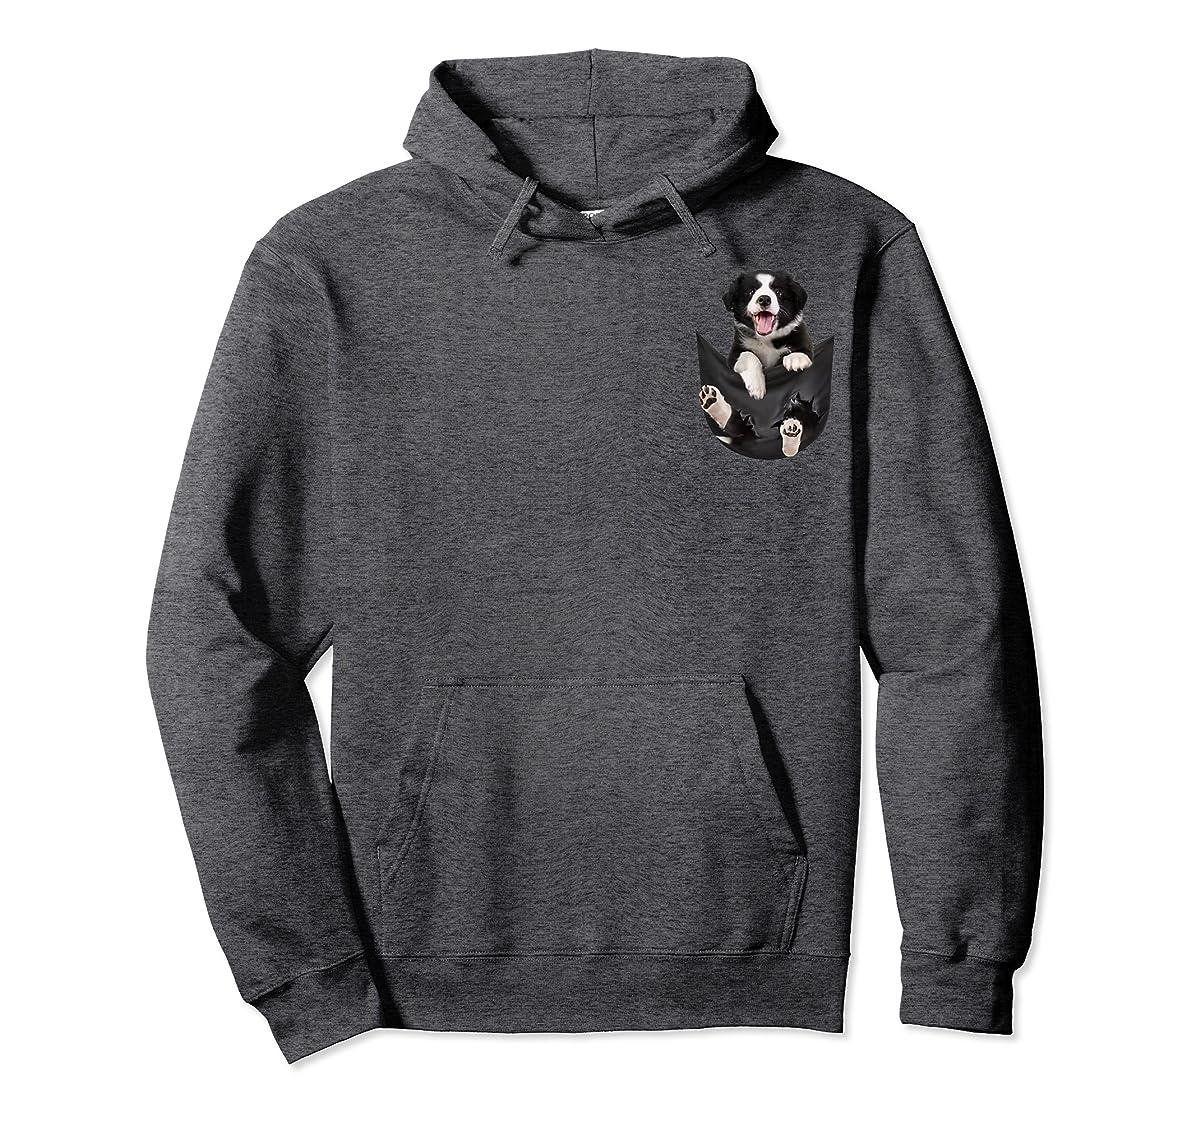 Gift dog funny cute shirt - Border Collie in pocket shirt T-Shirt-Hoodie-Dark Heather